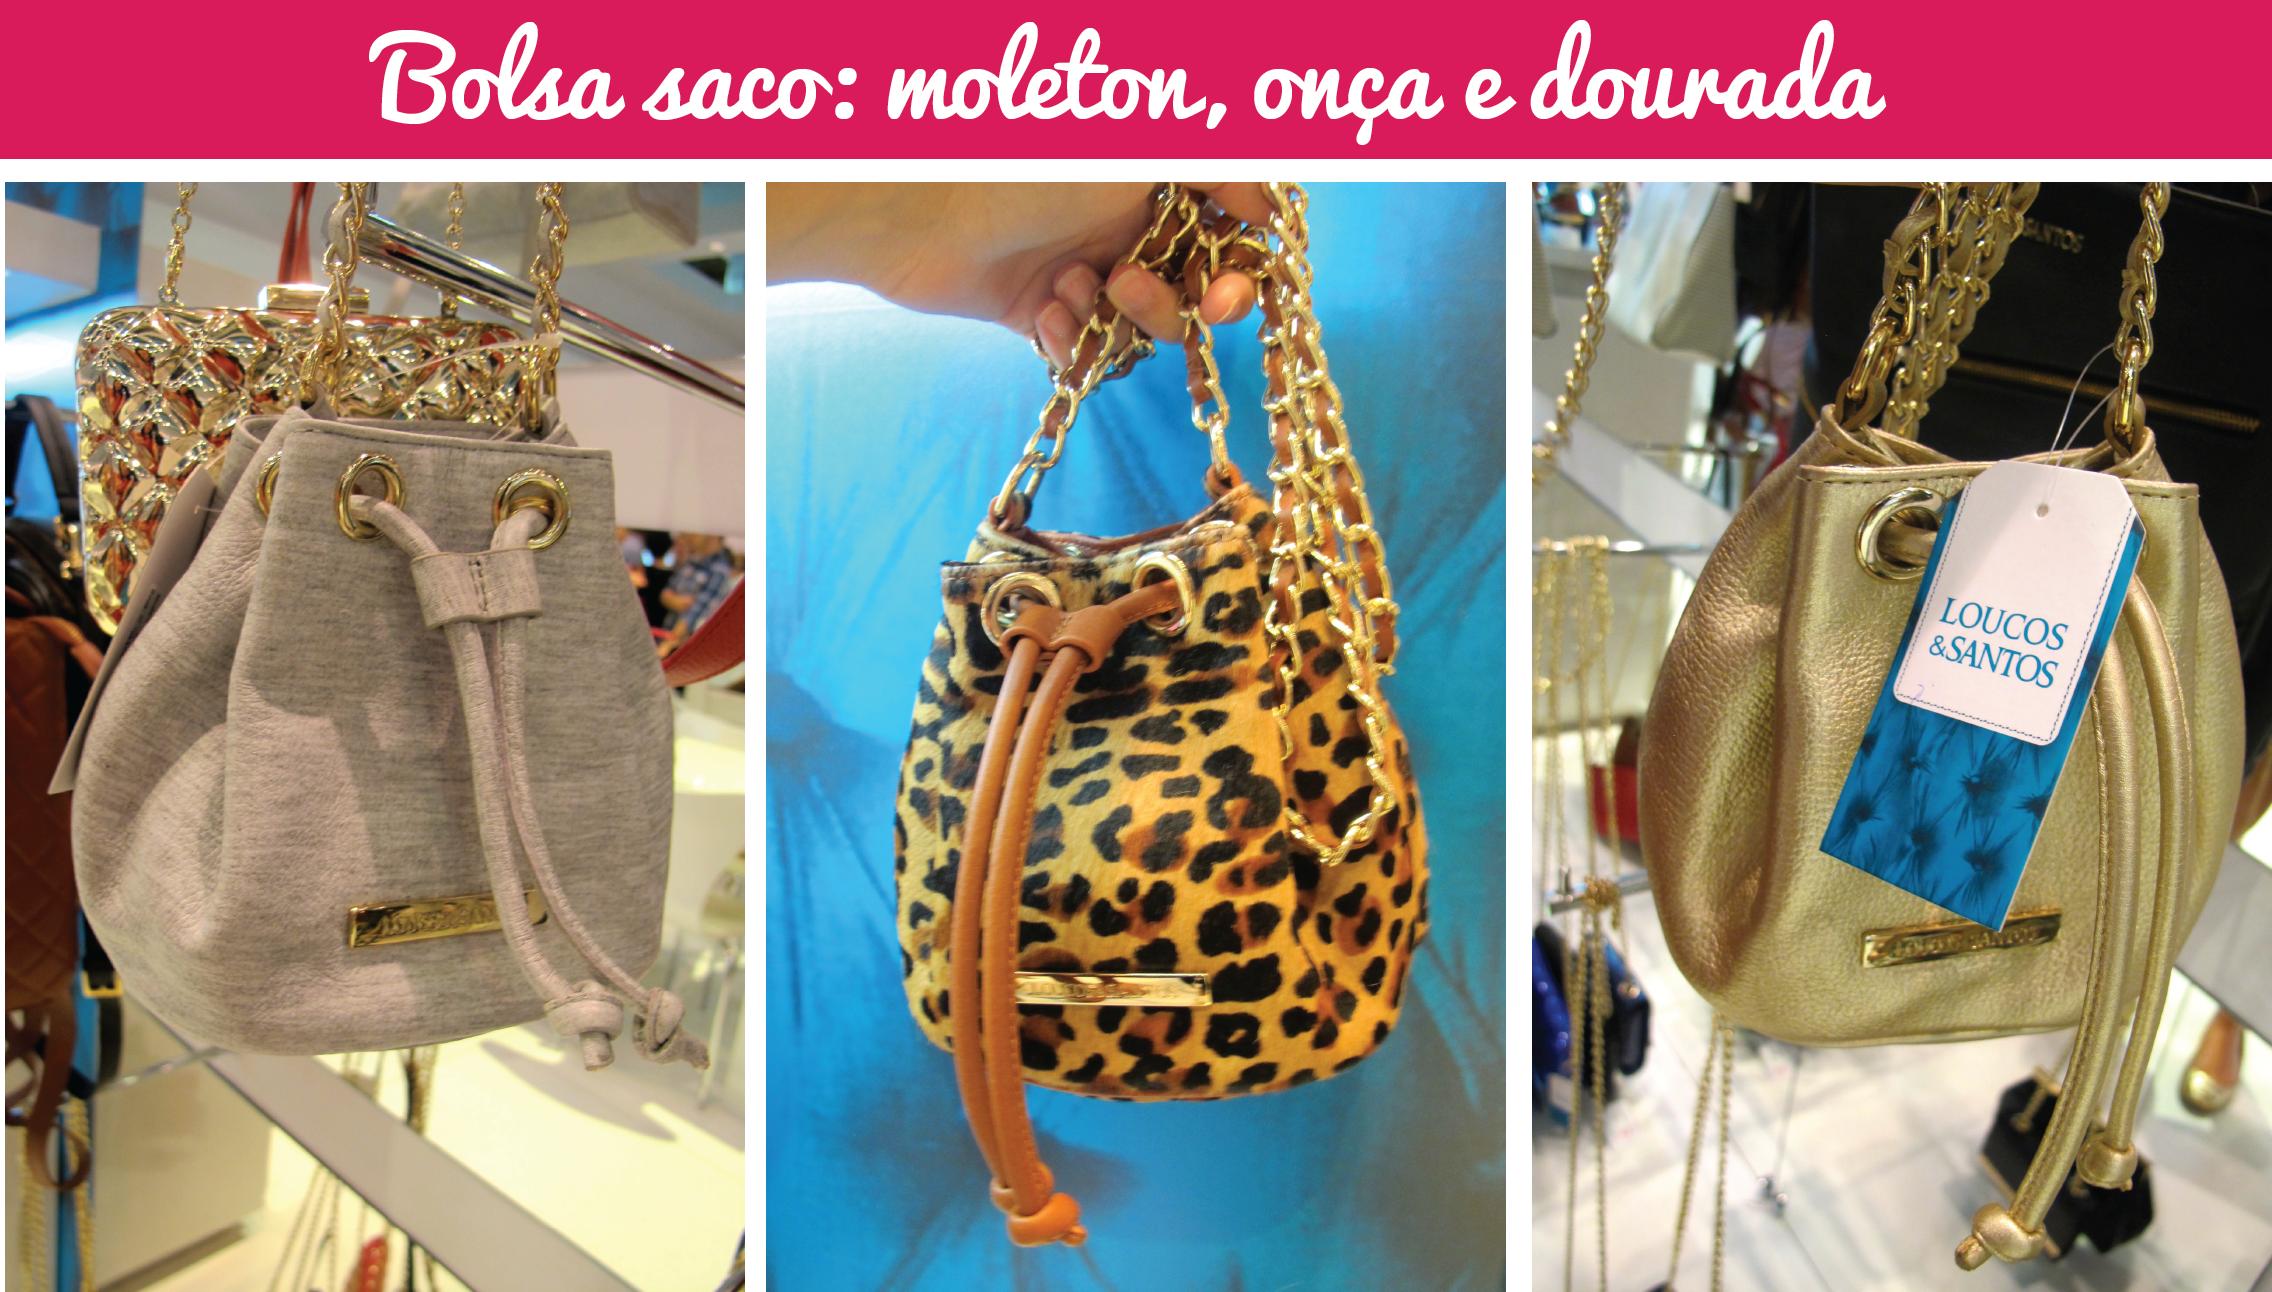 c87facc56 Couromoda 2015: Bolsa saco | Blog de moda do Brechó Capricho à Toa